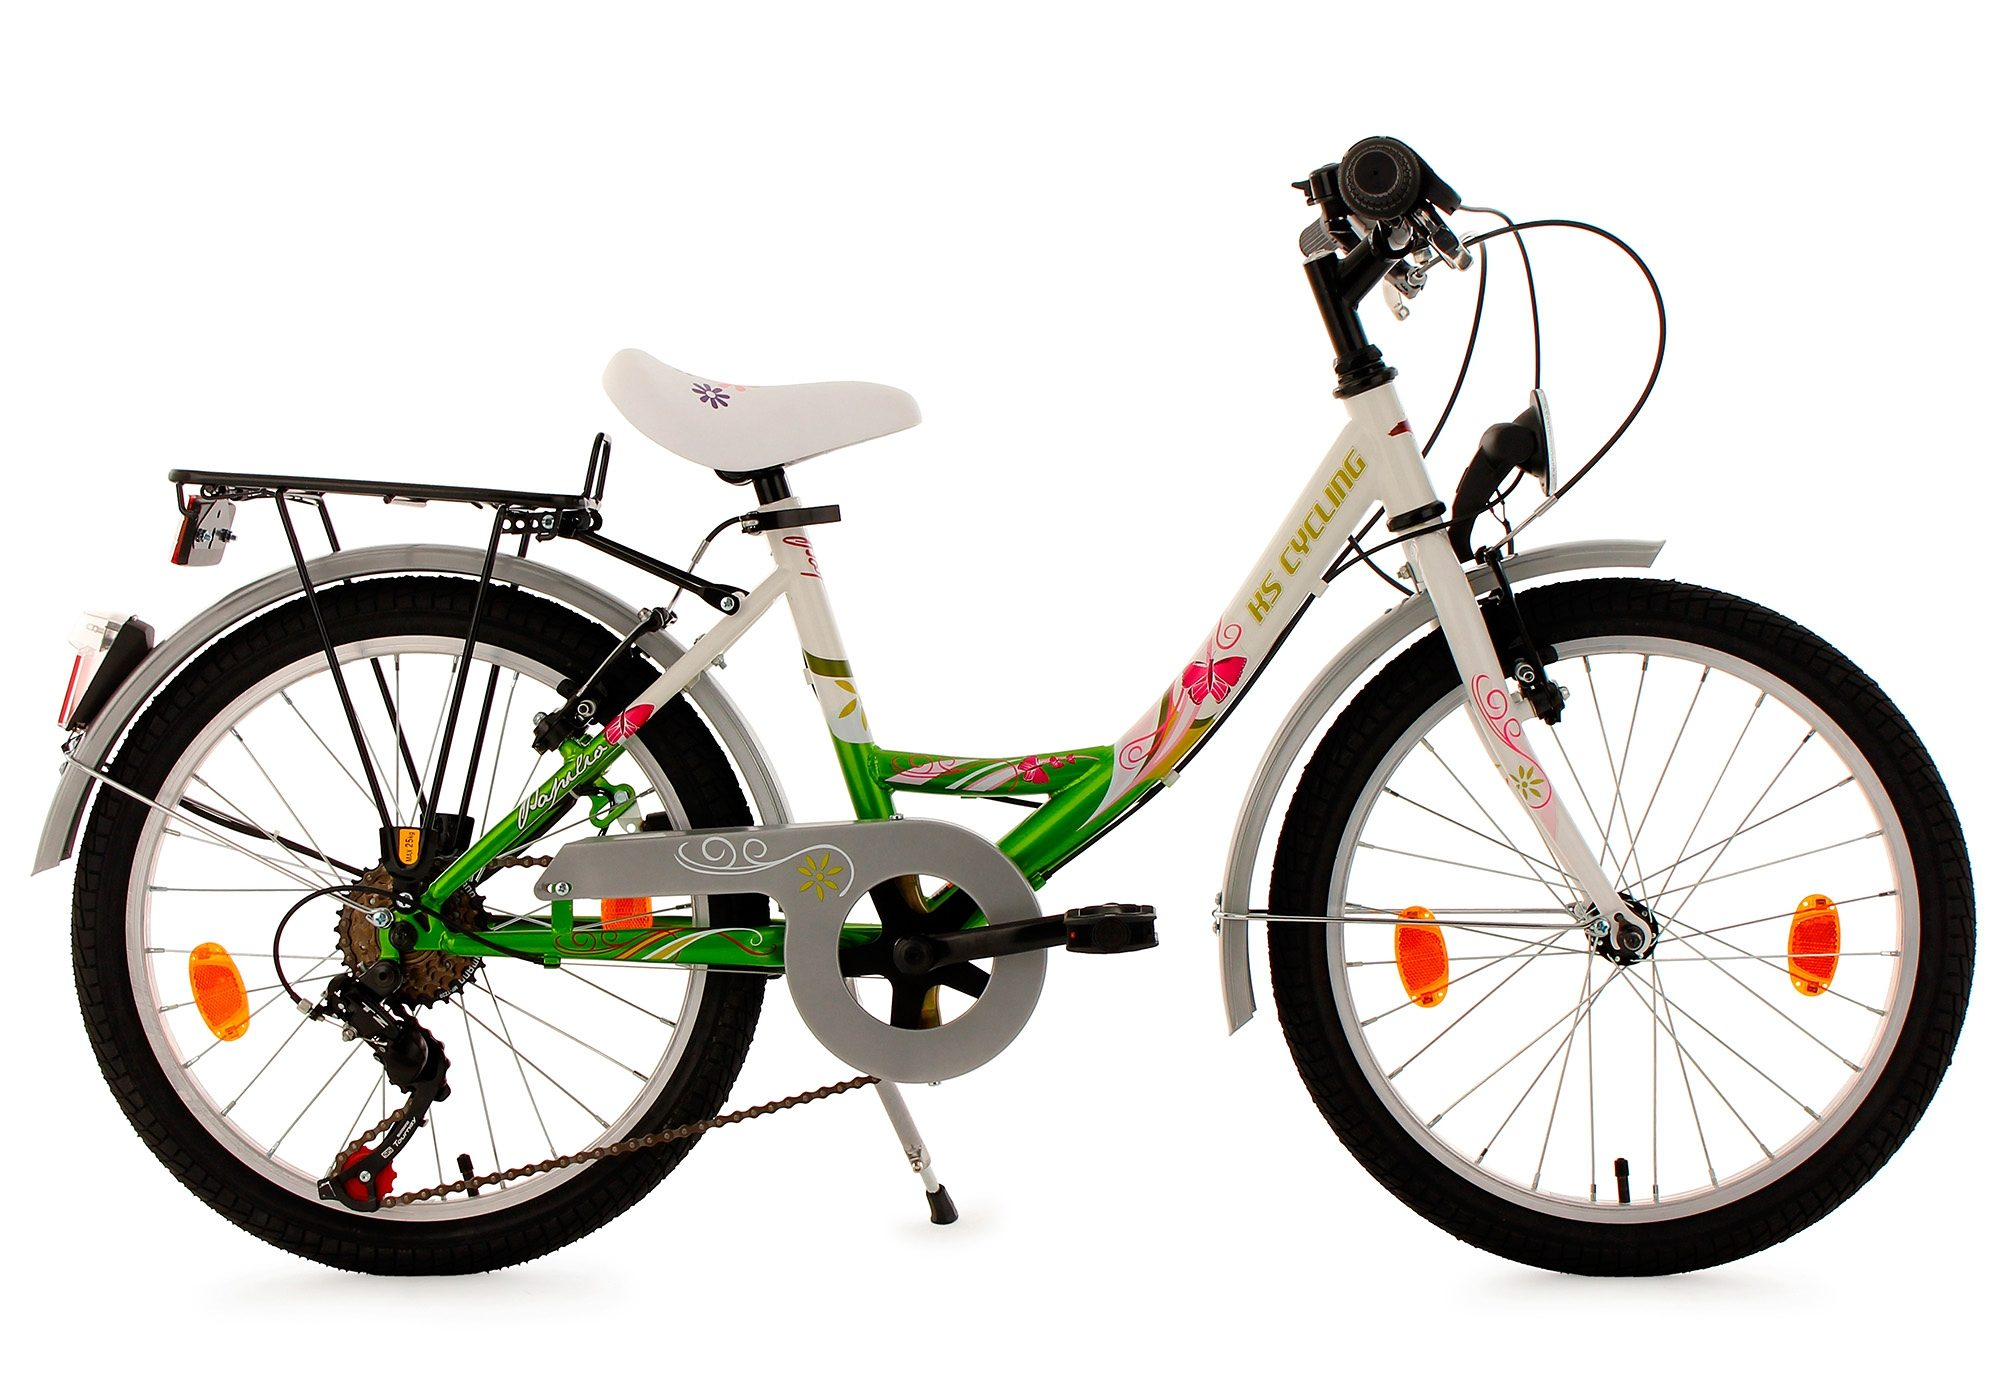 Kinderfahrrad, KS Cycling, »Papilio«, 20 Zoll, weiß, 6 Gang Shimano Tourney, V-Brake